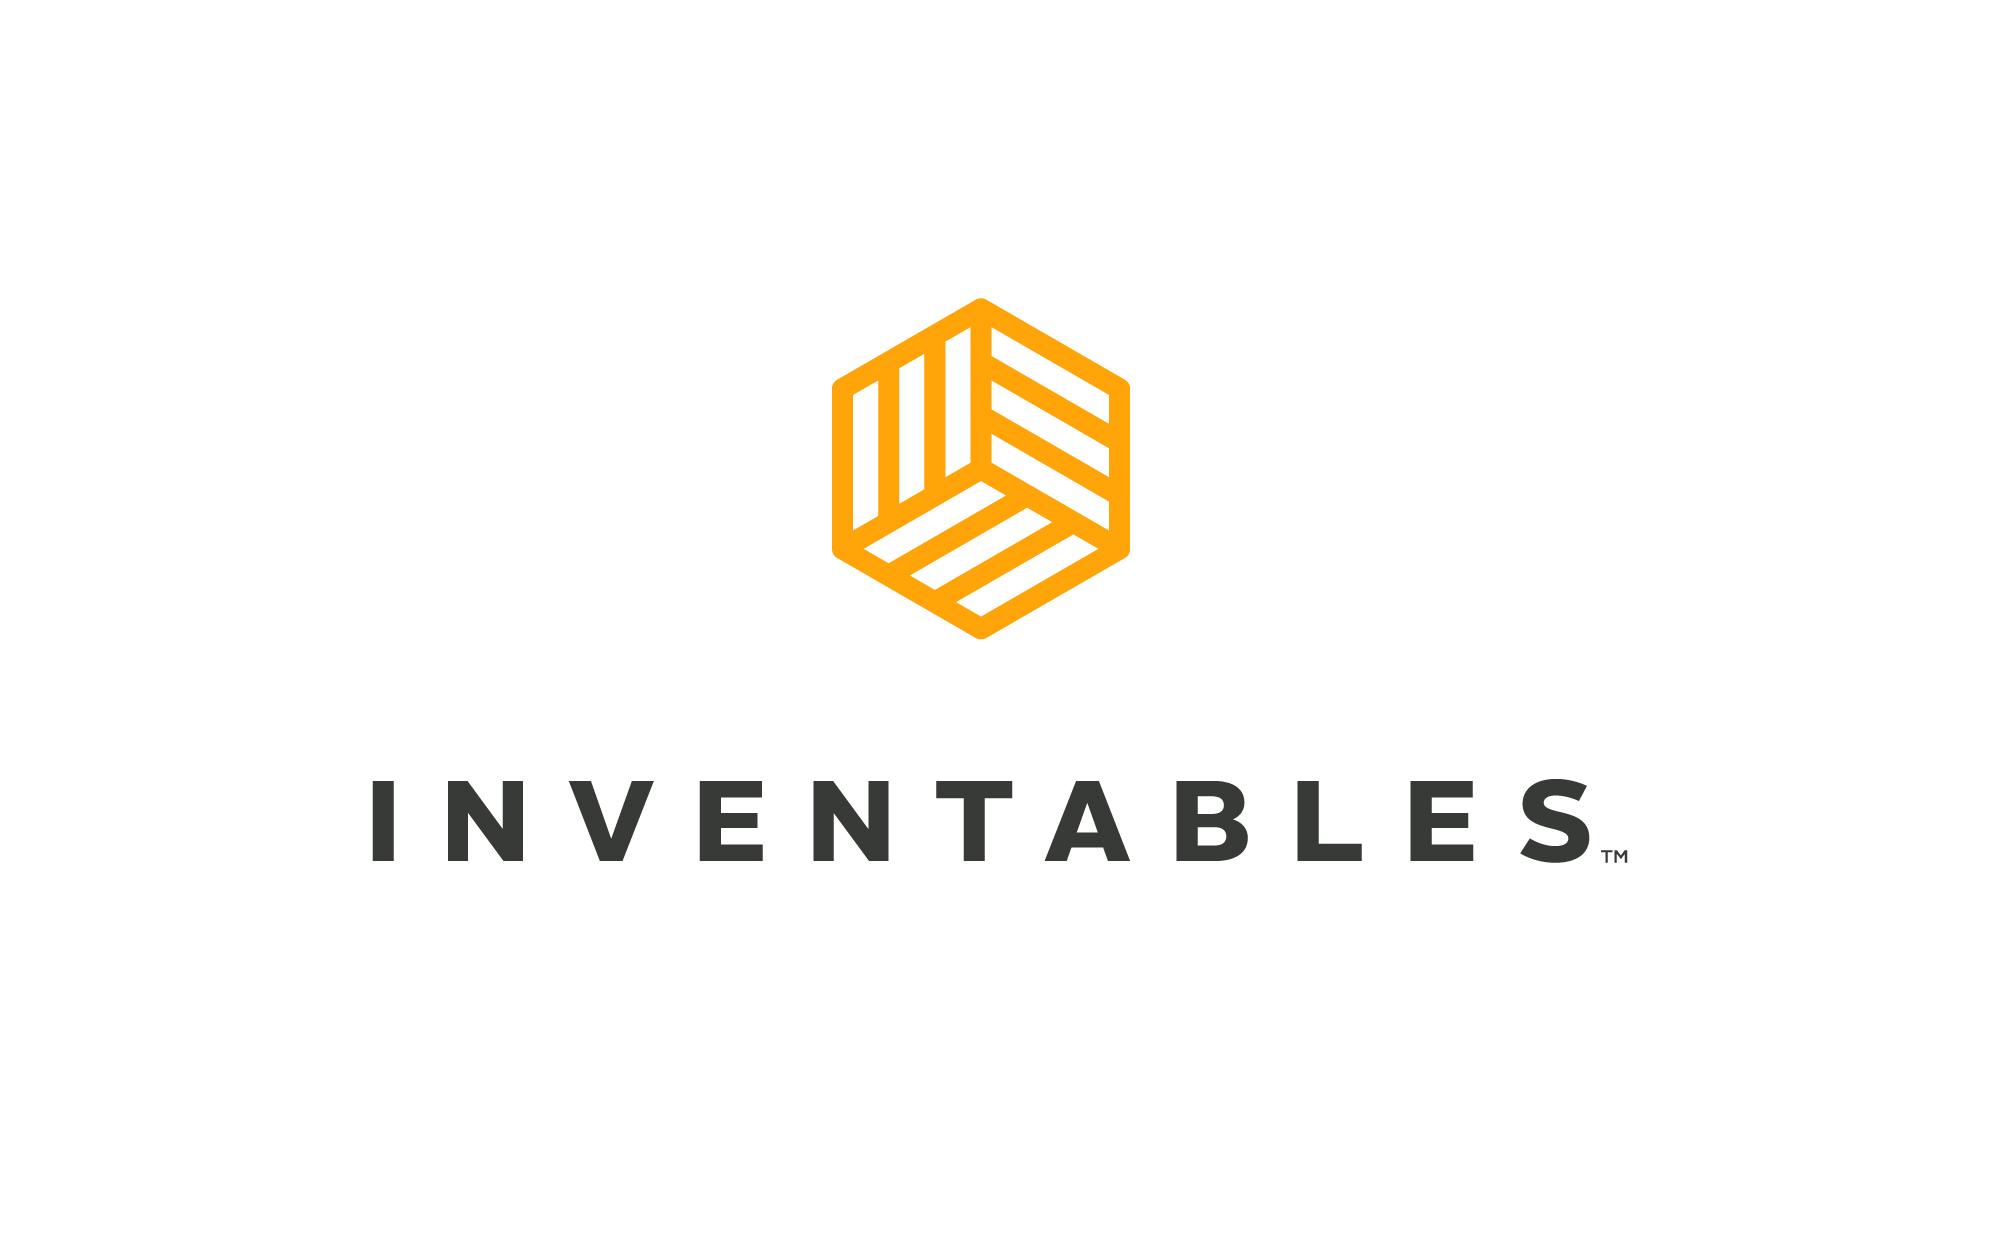 Lift-Inventables_id.jpg